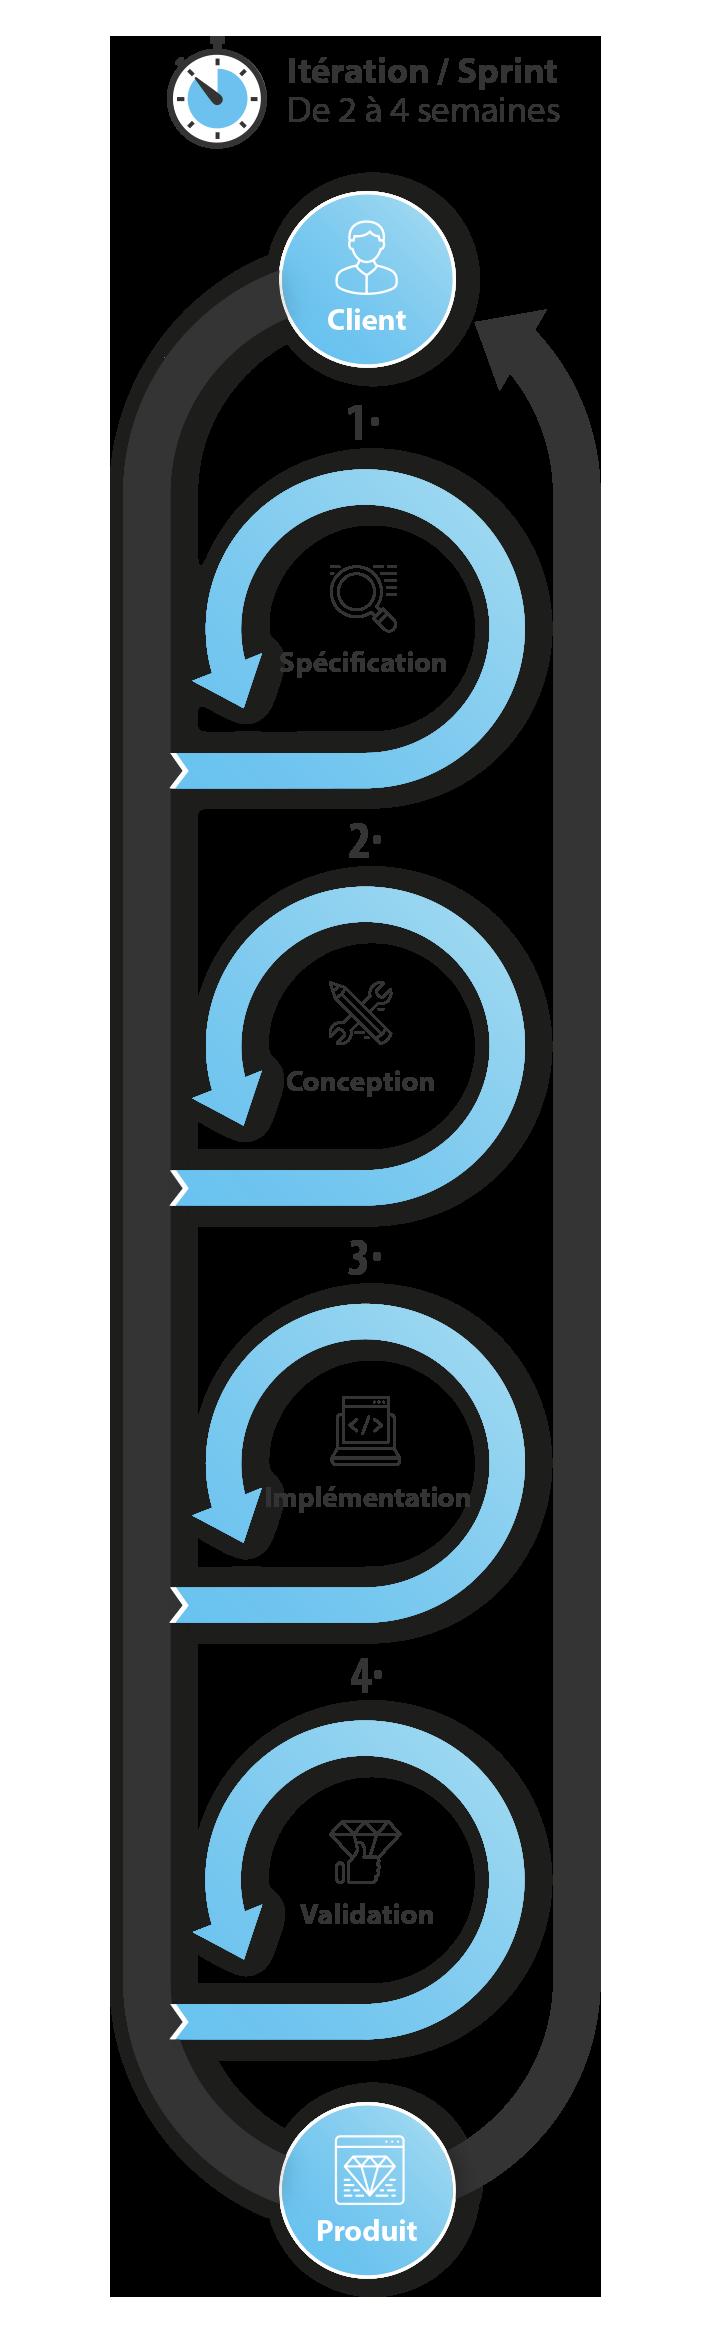 BlueScrum - Gestion de projet Agile, méthode Scrum